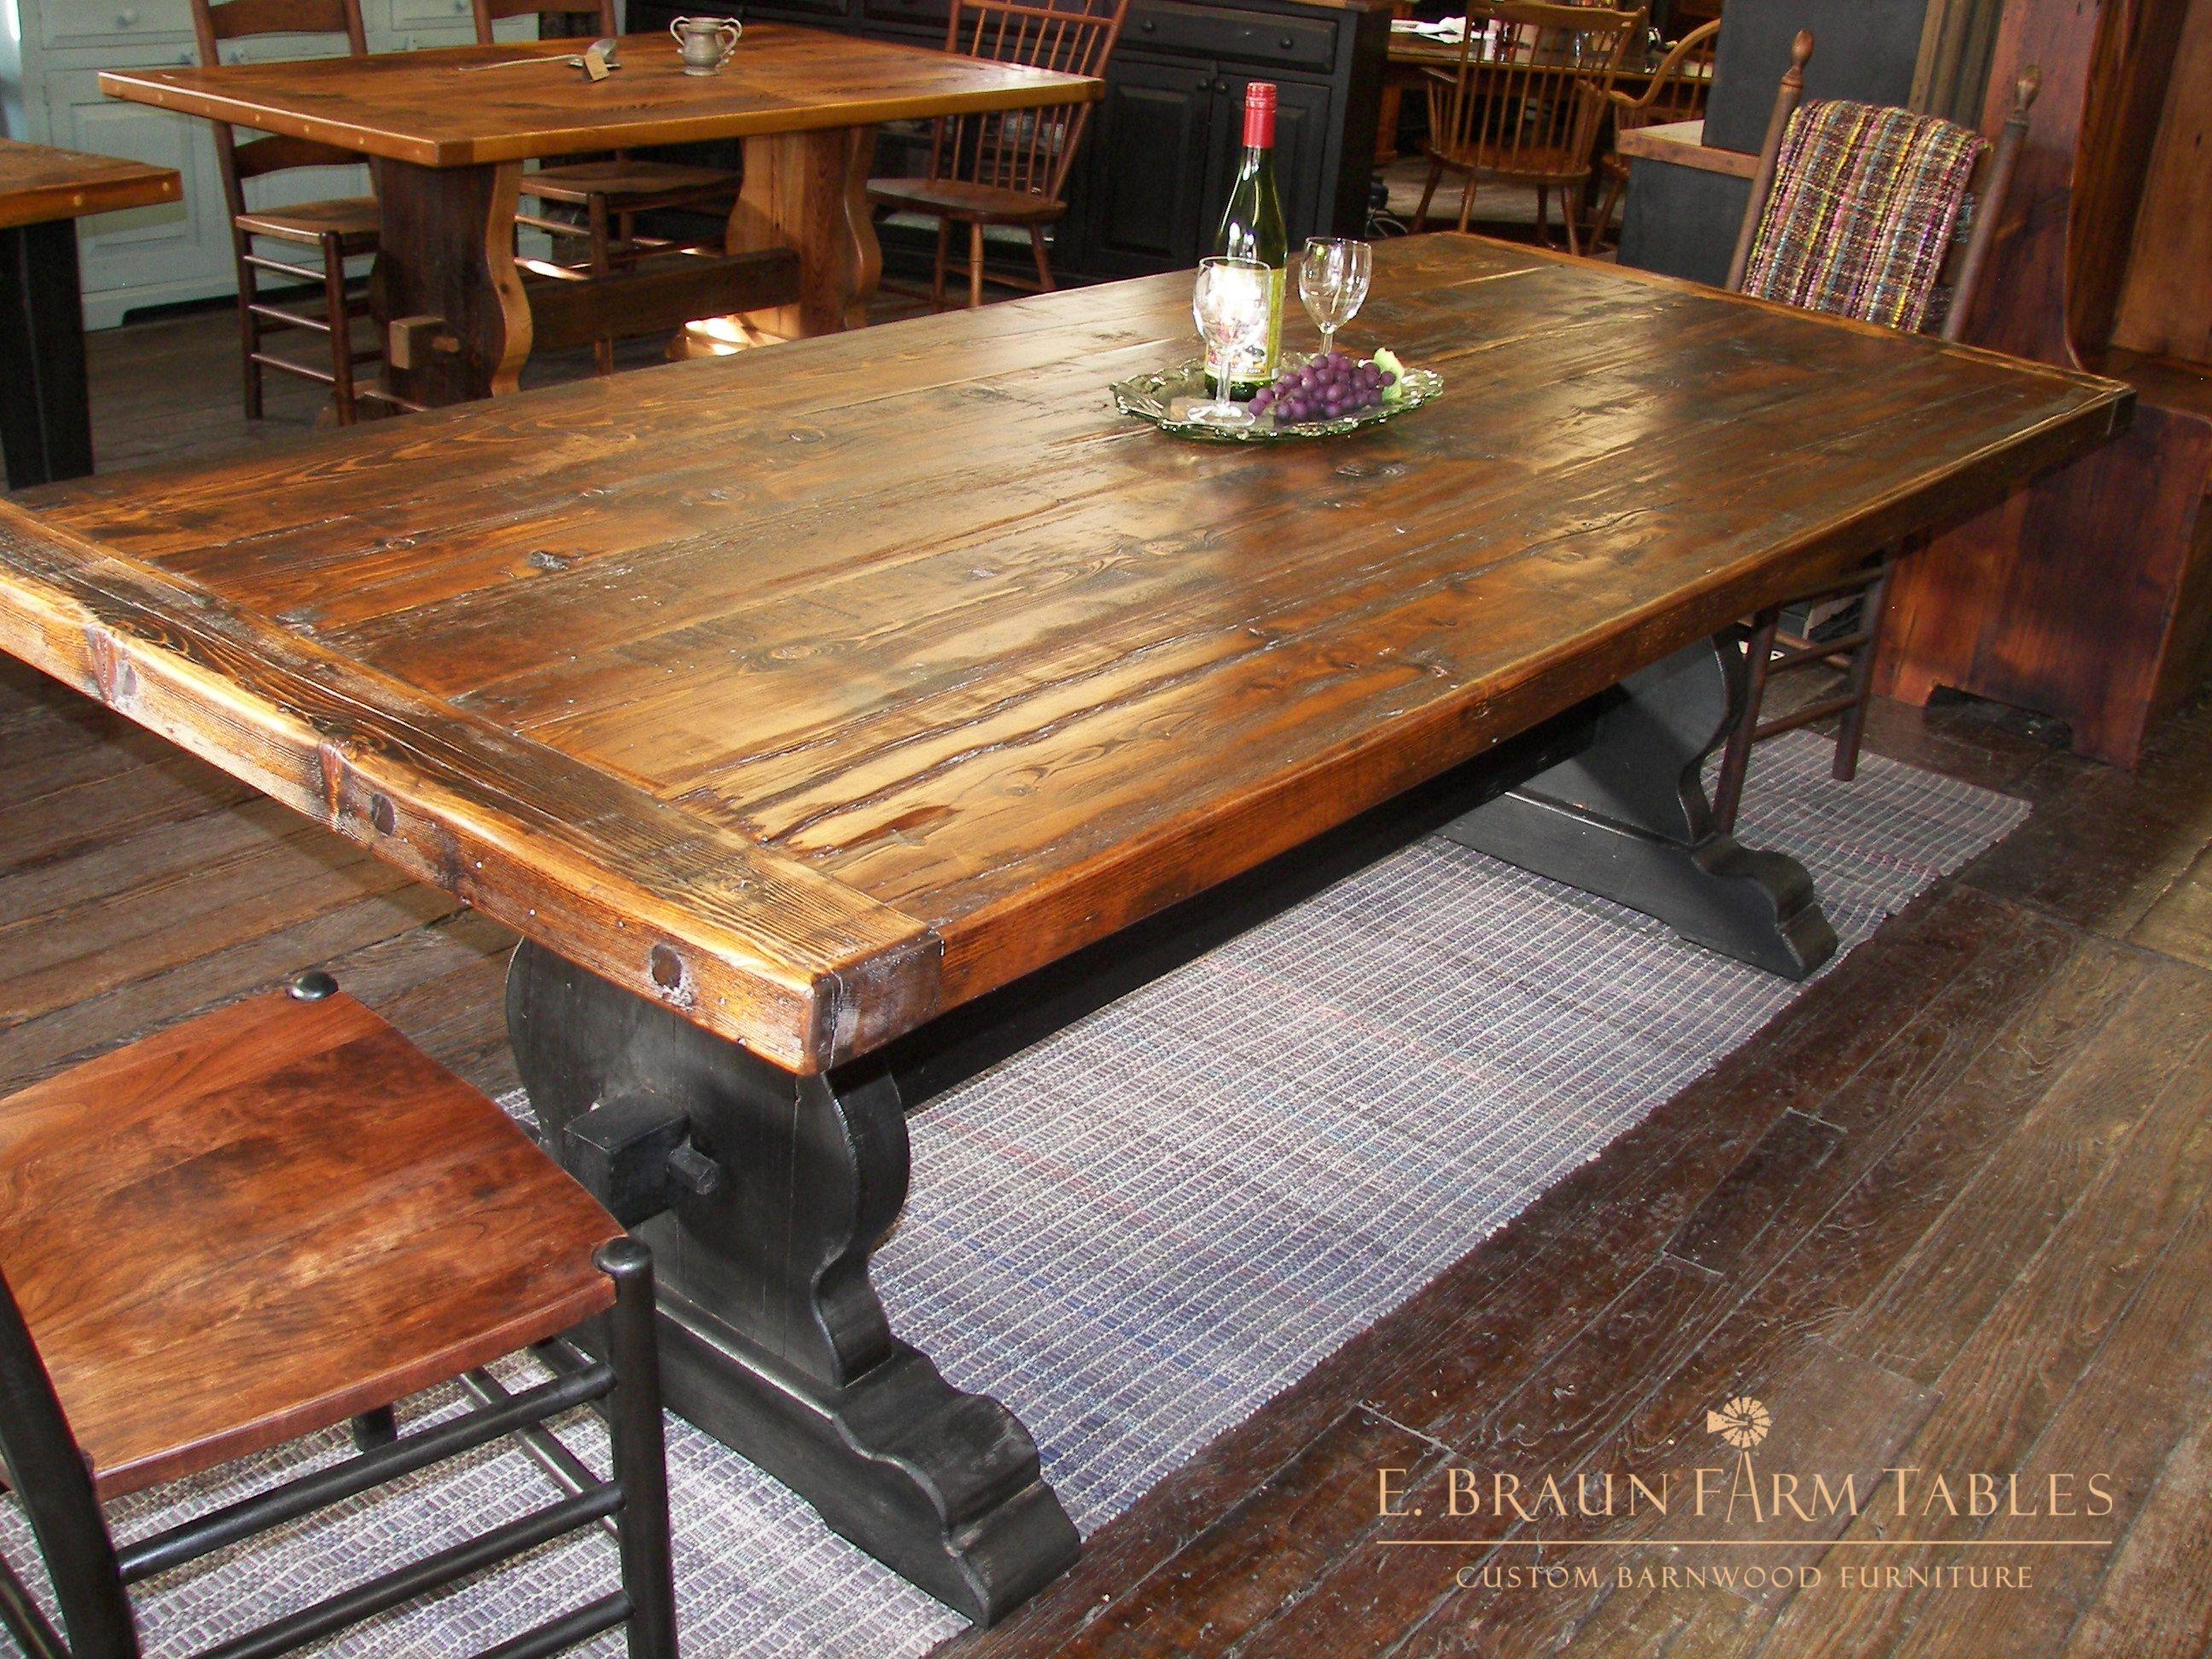 8 Long Medium Character Dark Tudor Vase Trestle Base Table This